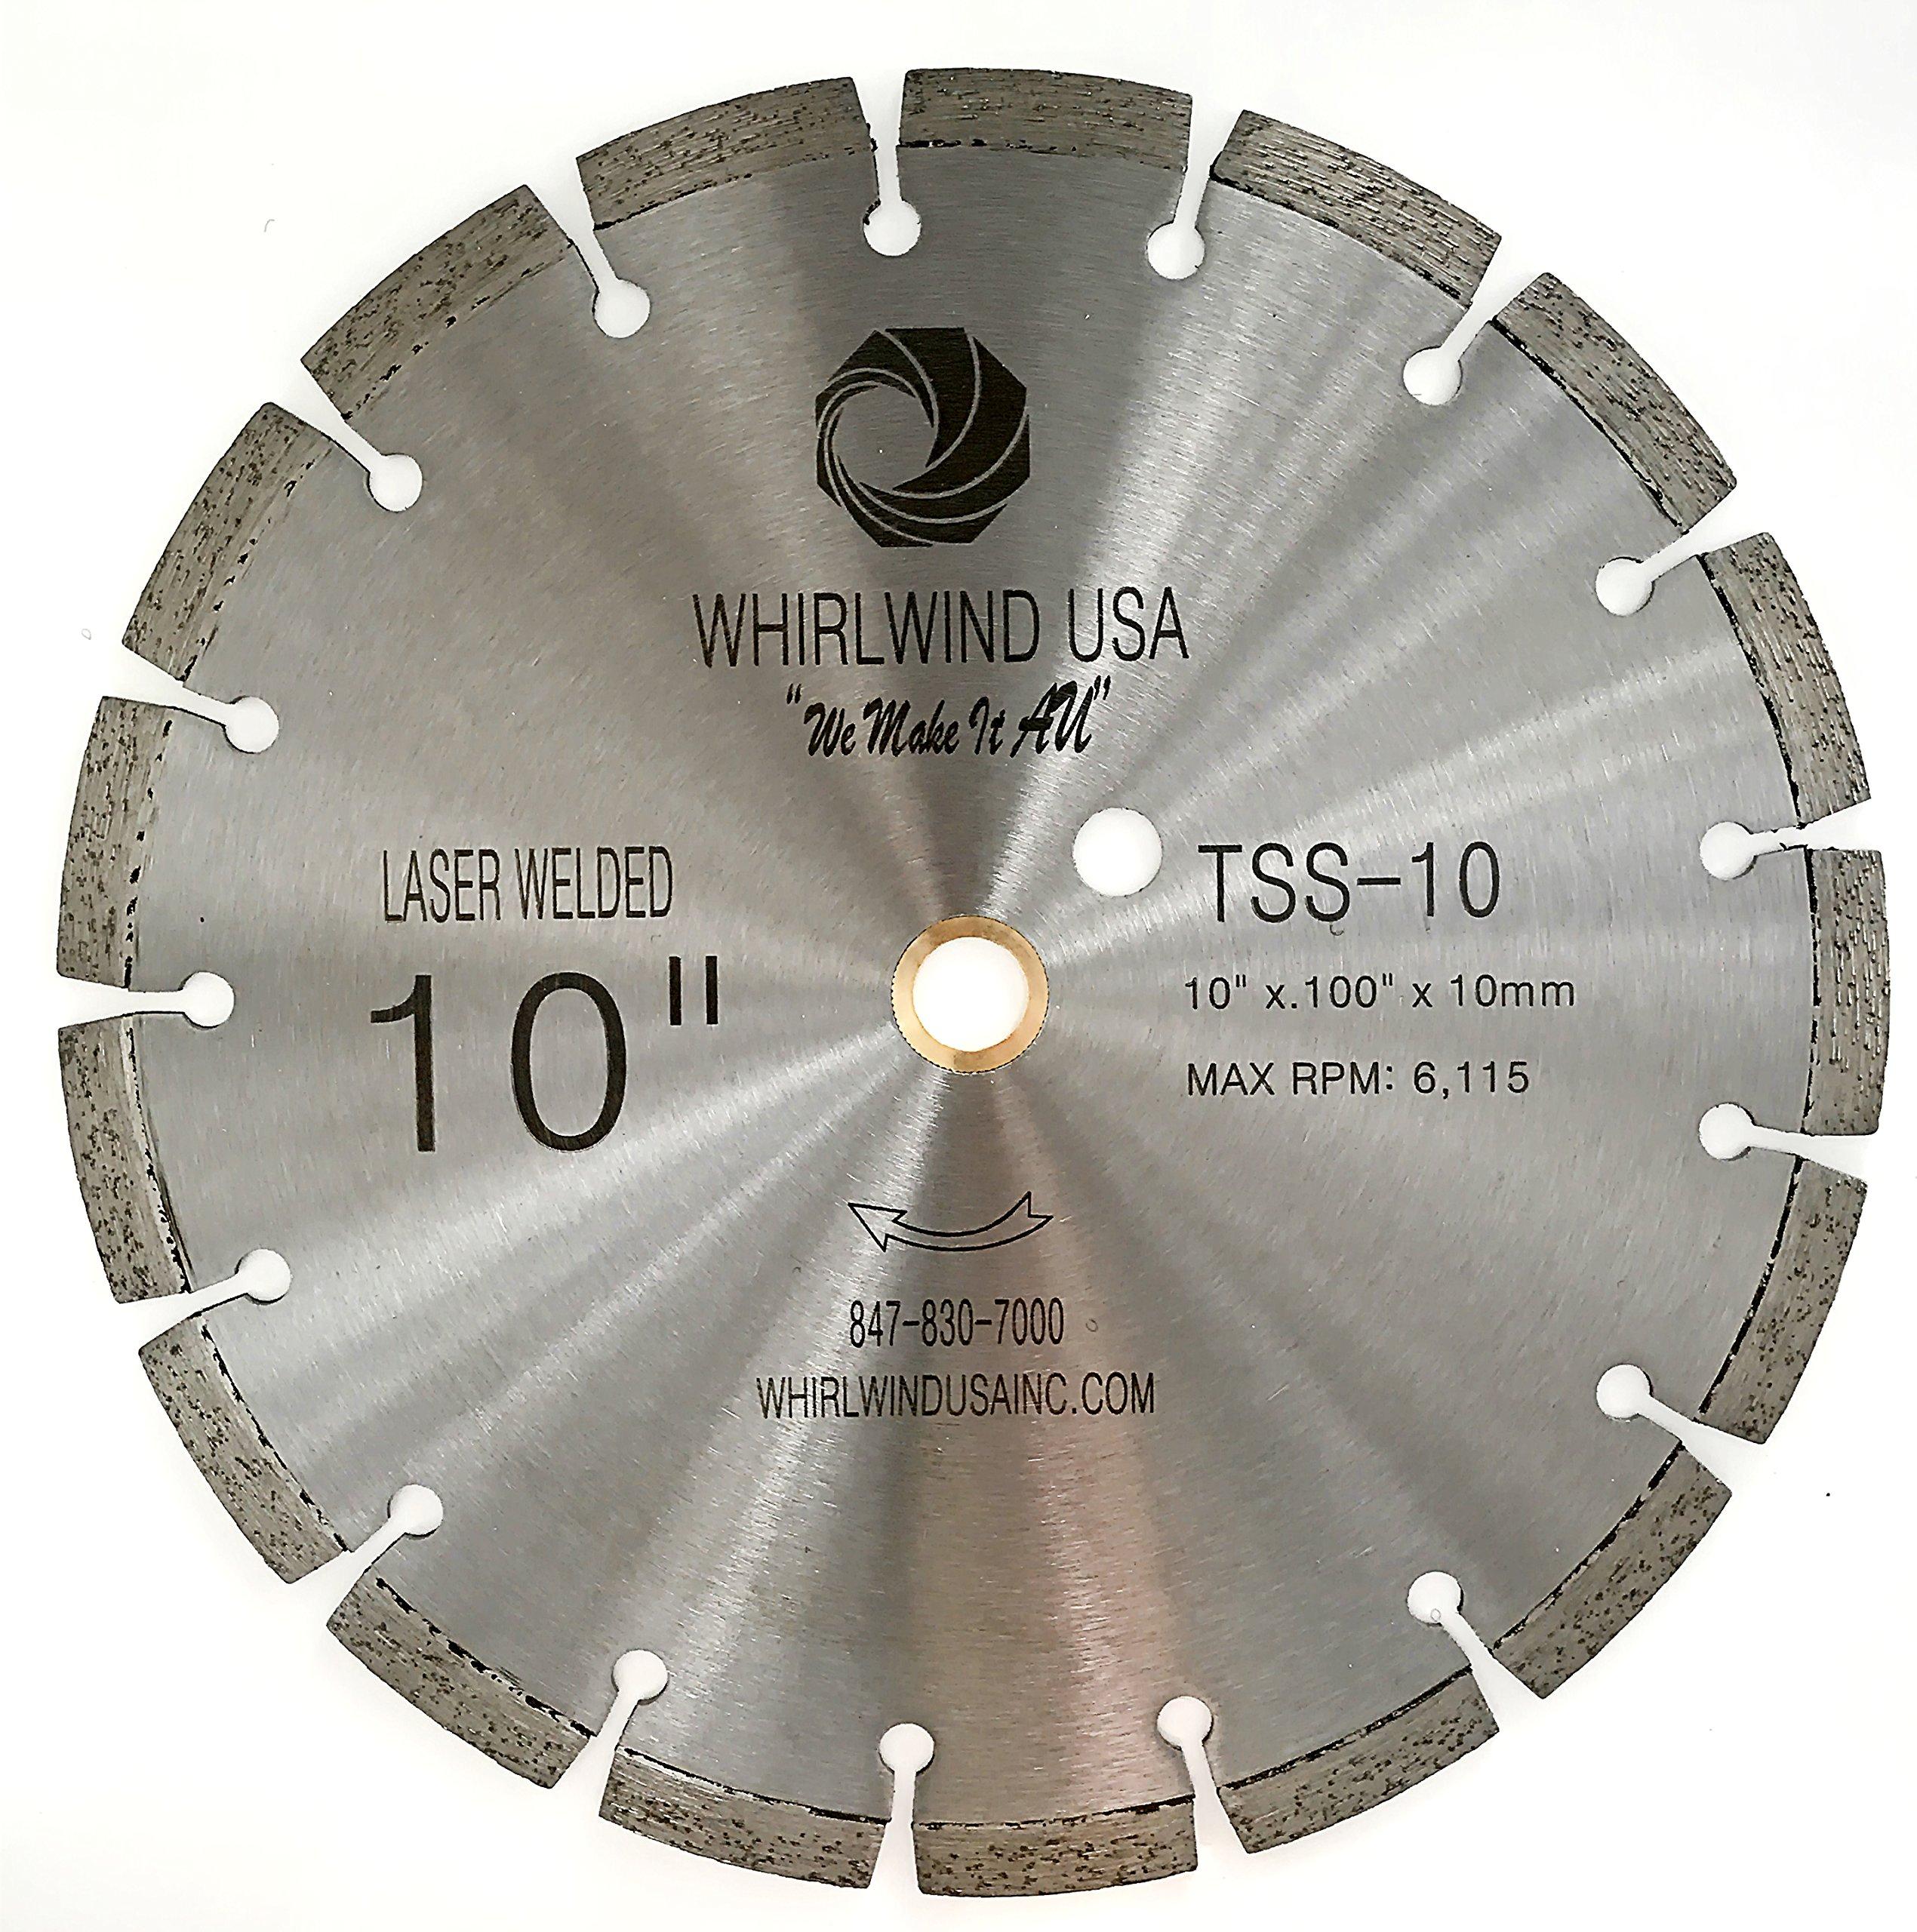 Disco de Diamante WHIRLWIND segmentadas estándar de uso general secas o húmedas soldadas con láser TSS de 10 pulg. (vent